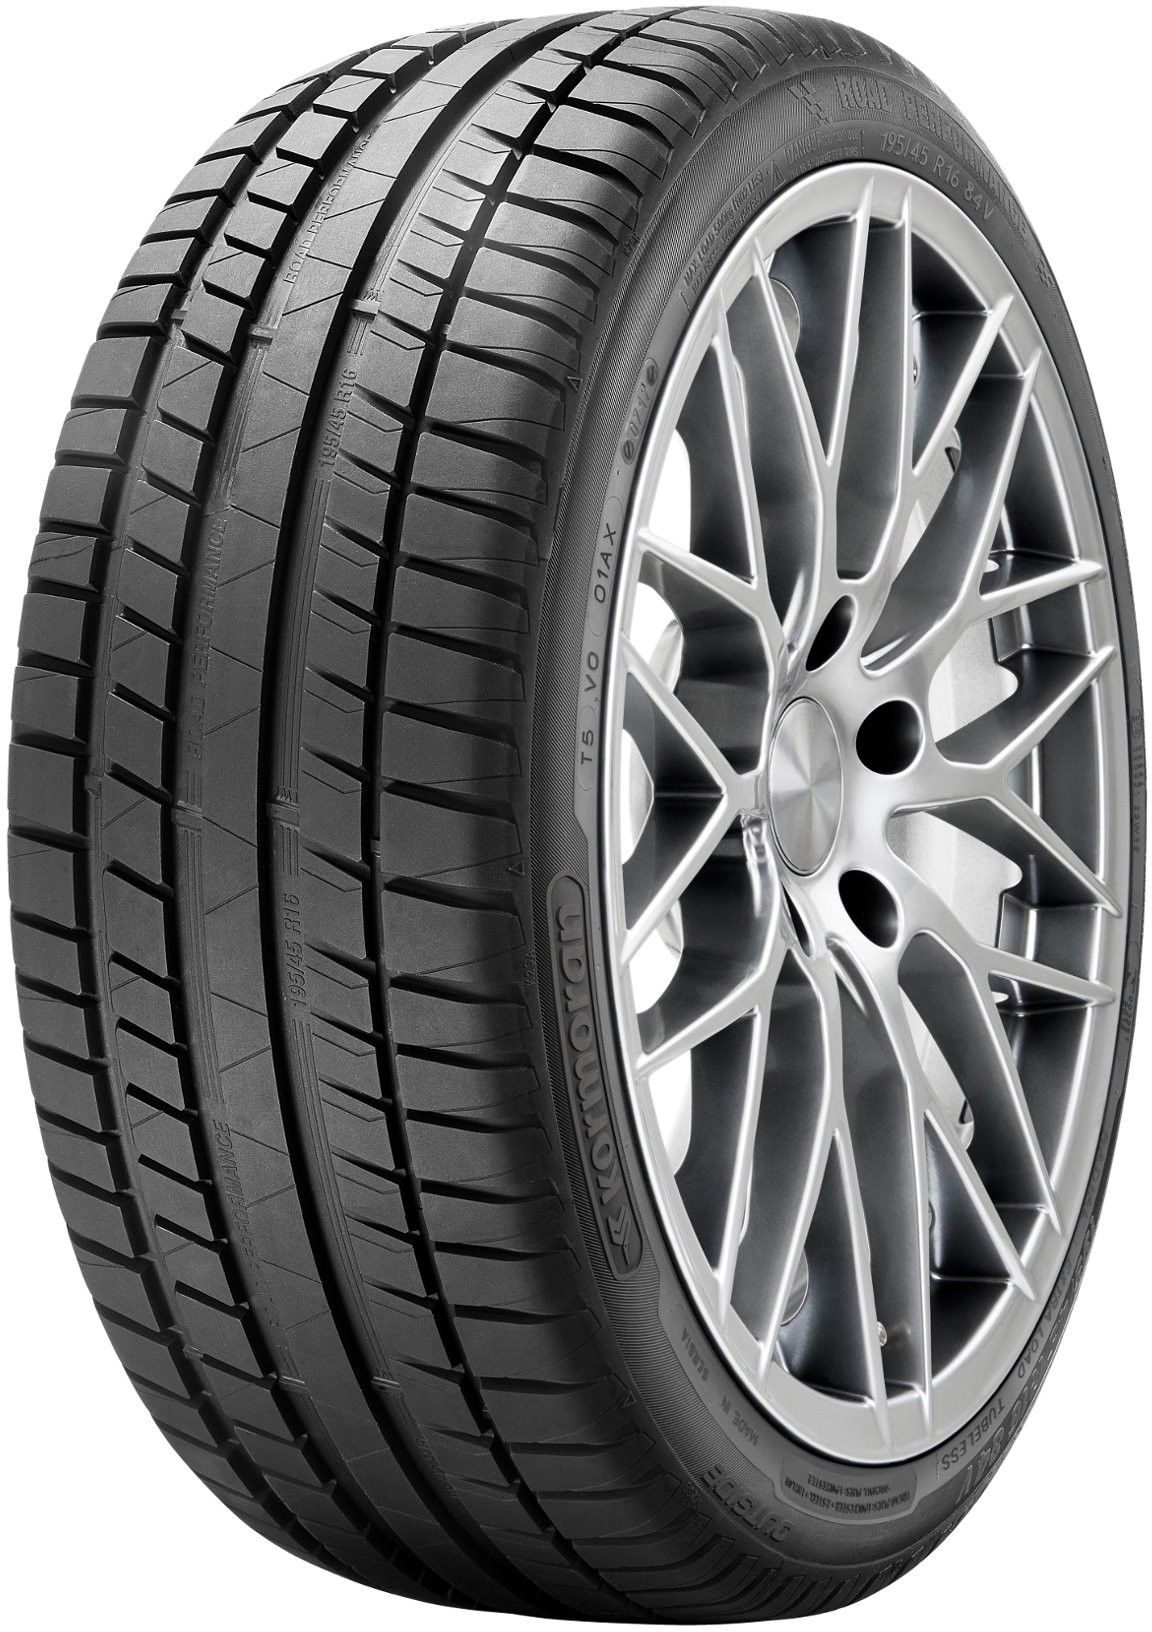 Kormoran Road Performance 205/55 R16 94 W